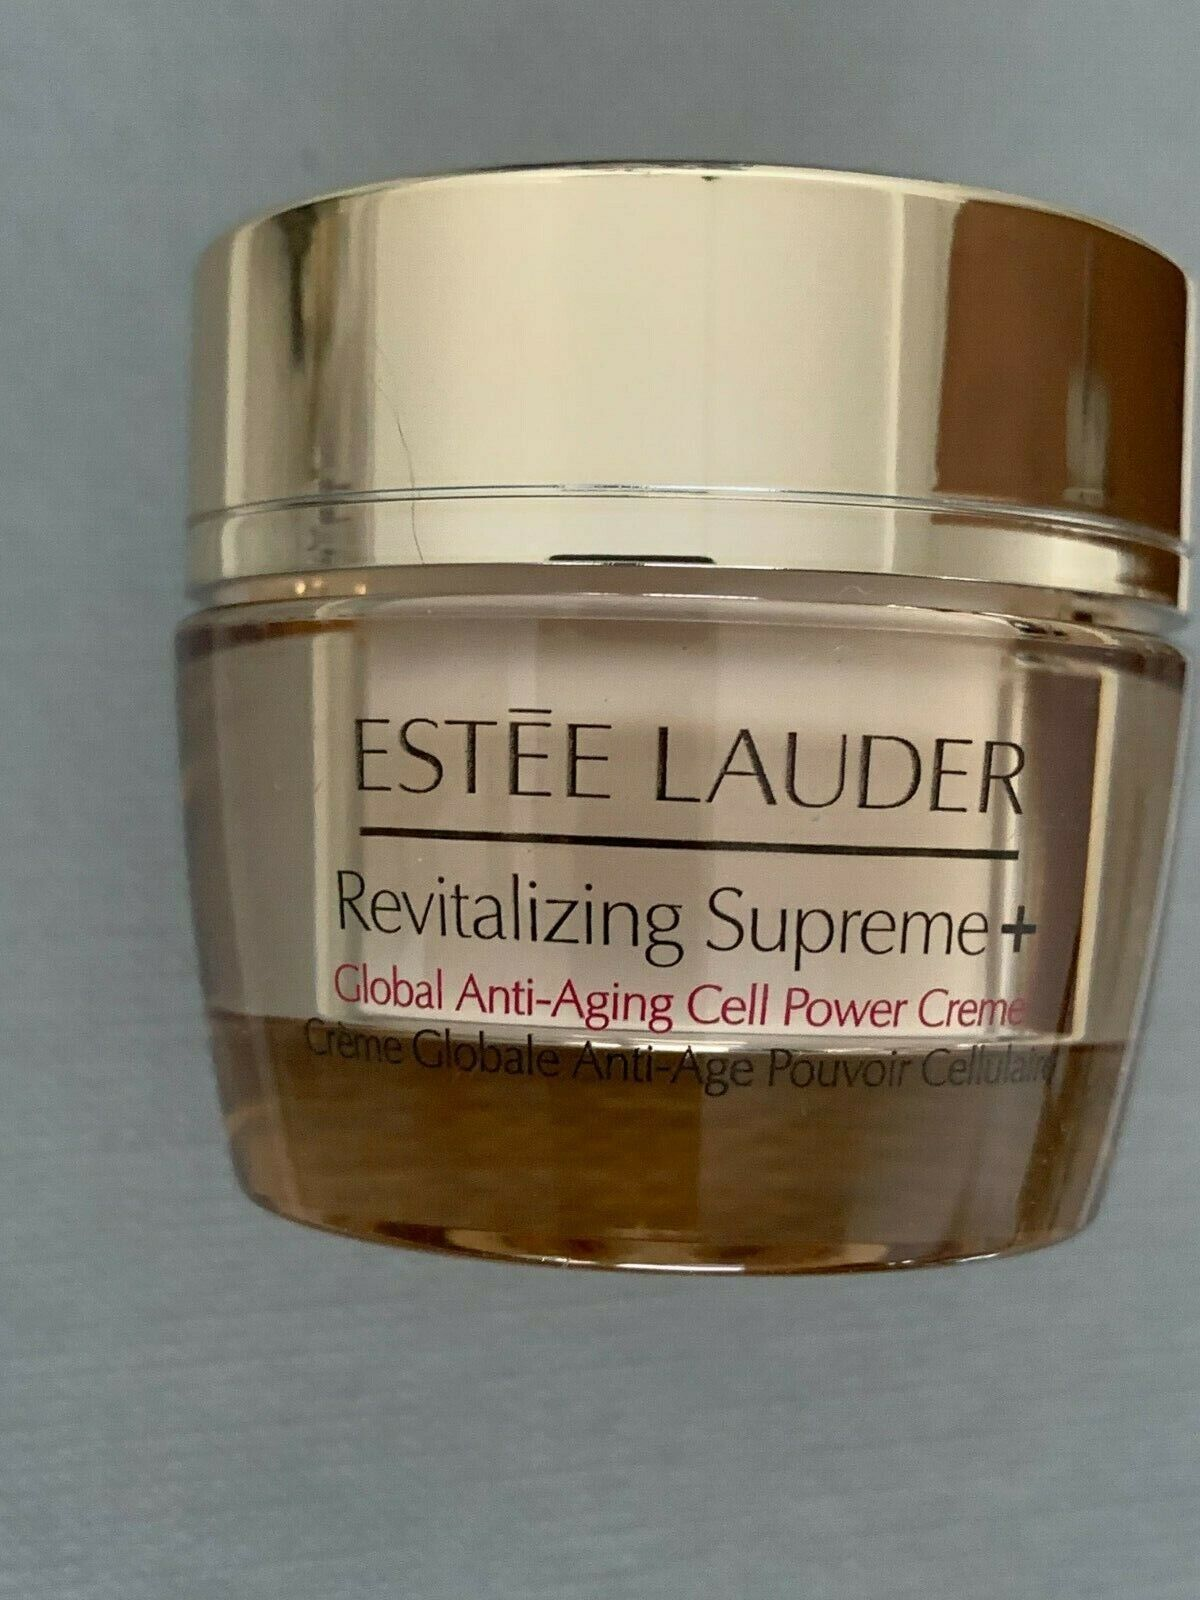 ESTEE LAUDER Revitalizing Supreme Global Anti-Aging Cell Power Creme - 15ml NEU